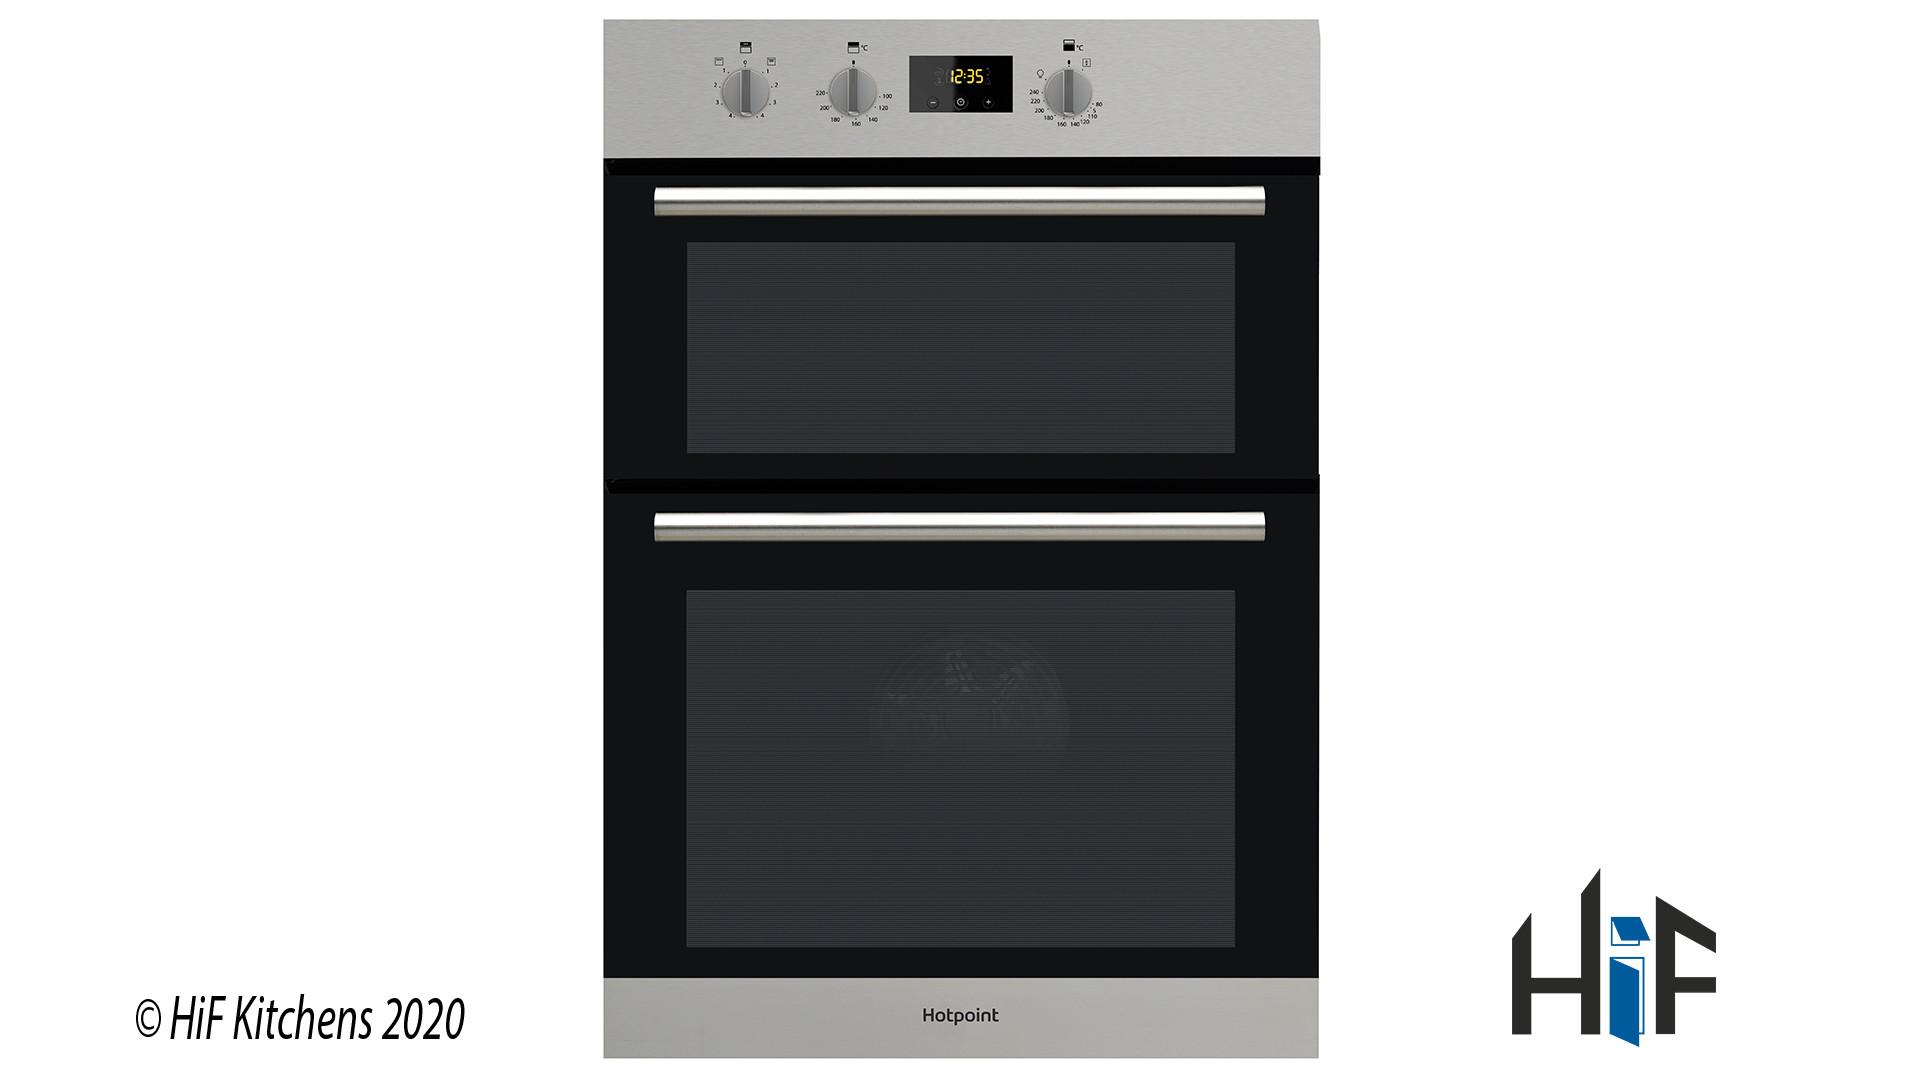 Hotpoint Class 2 DD2 540 IX Built-In Oven